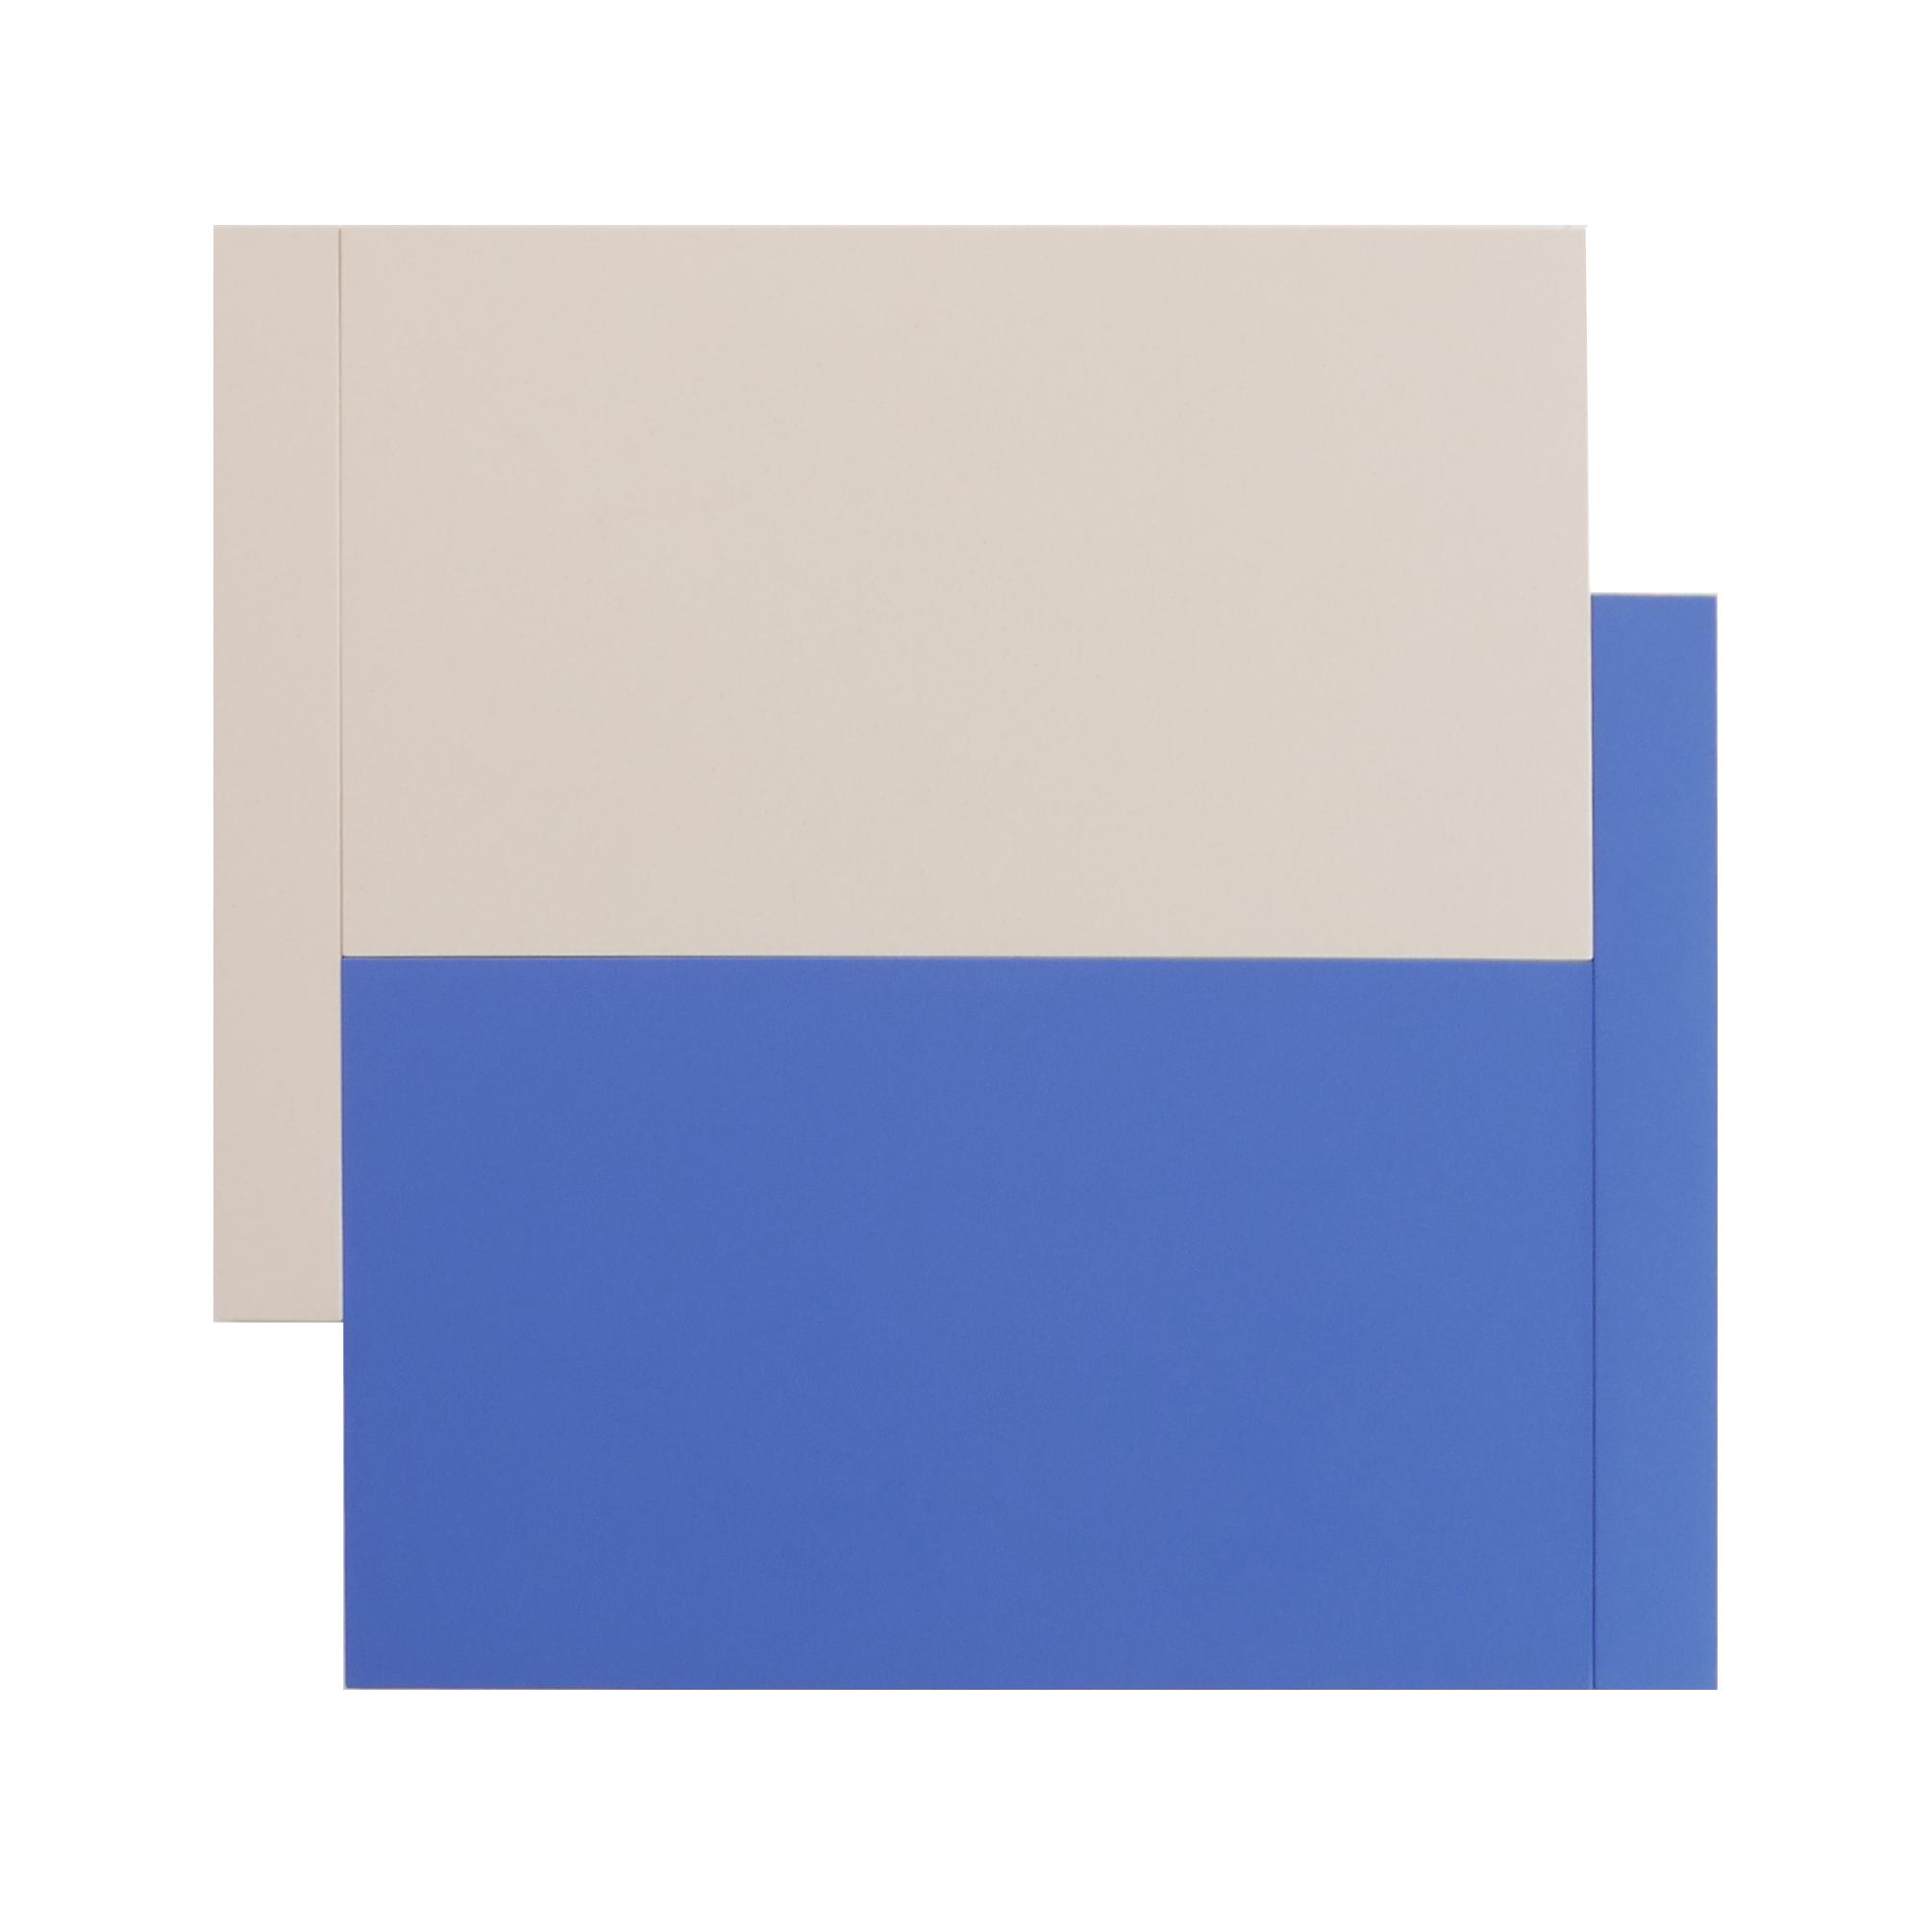 "SHIFT CANVAS, BLUE   Acrylic on canvas   48 x 48""   INQUIRE"